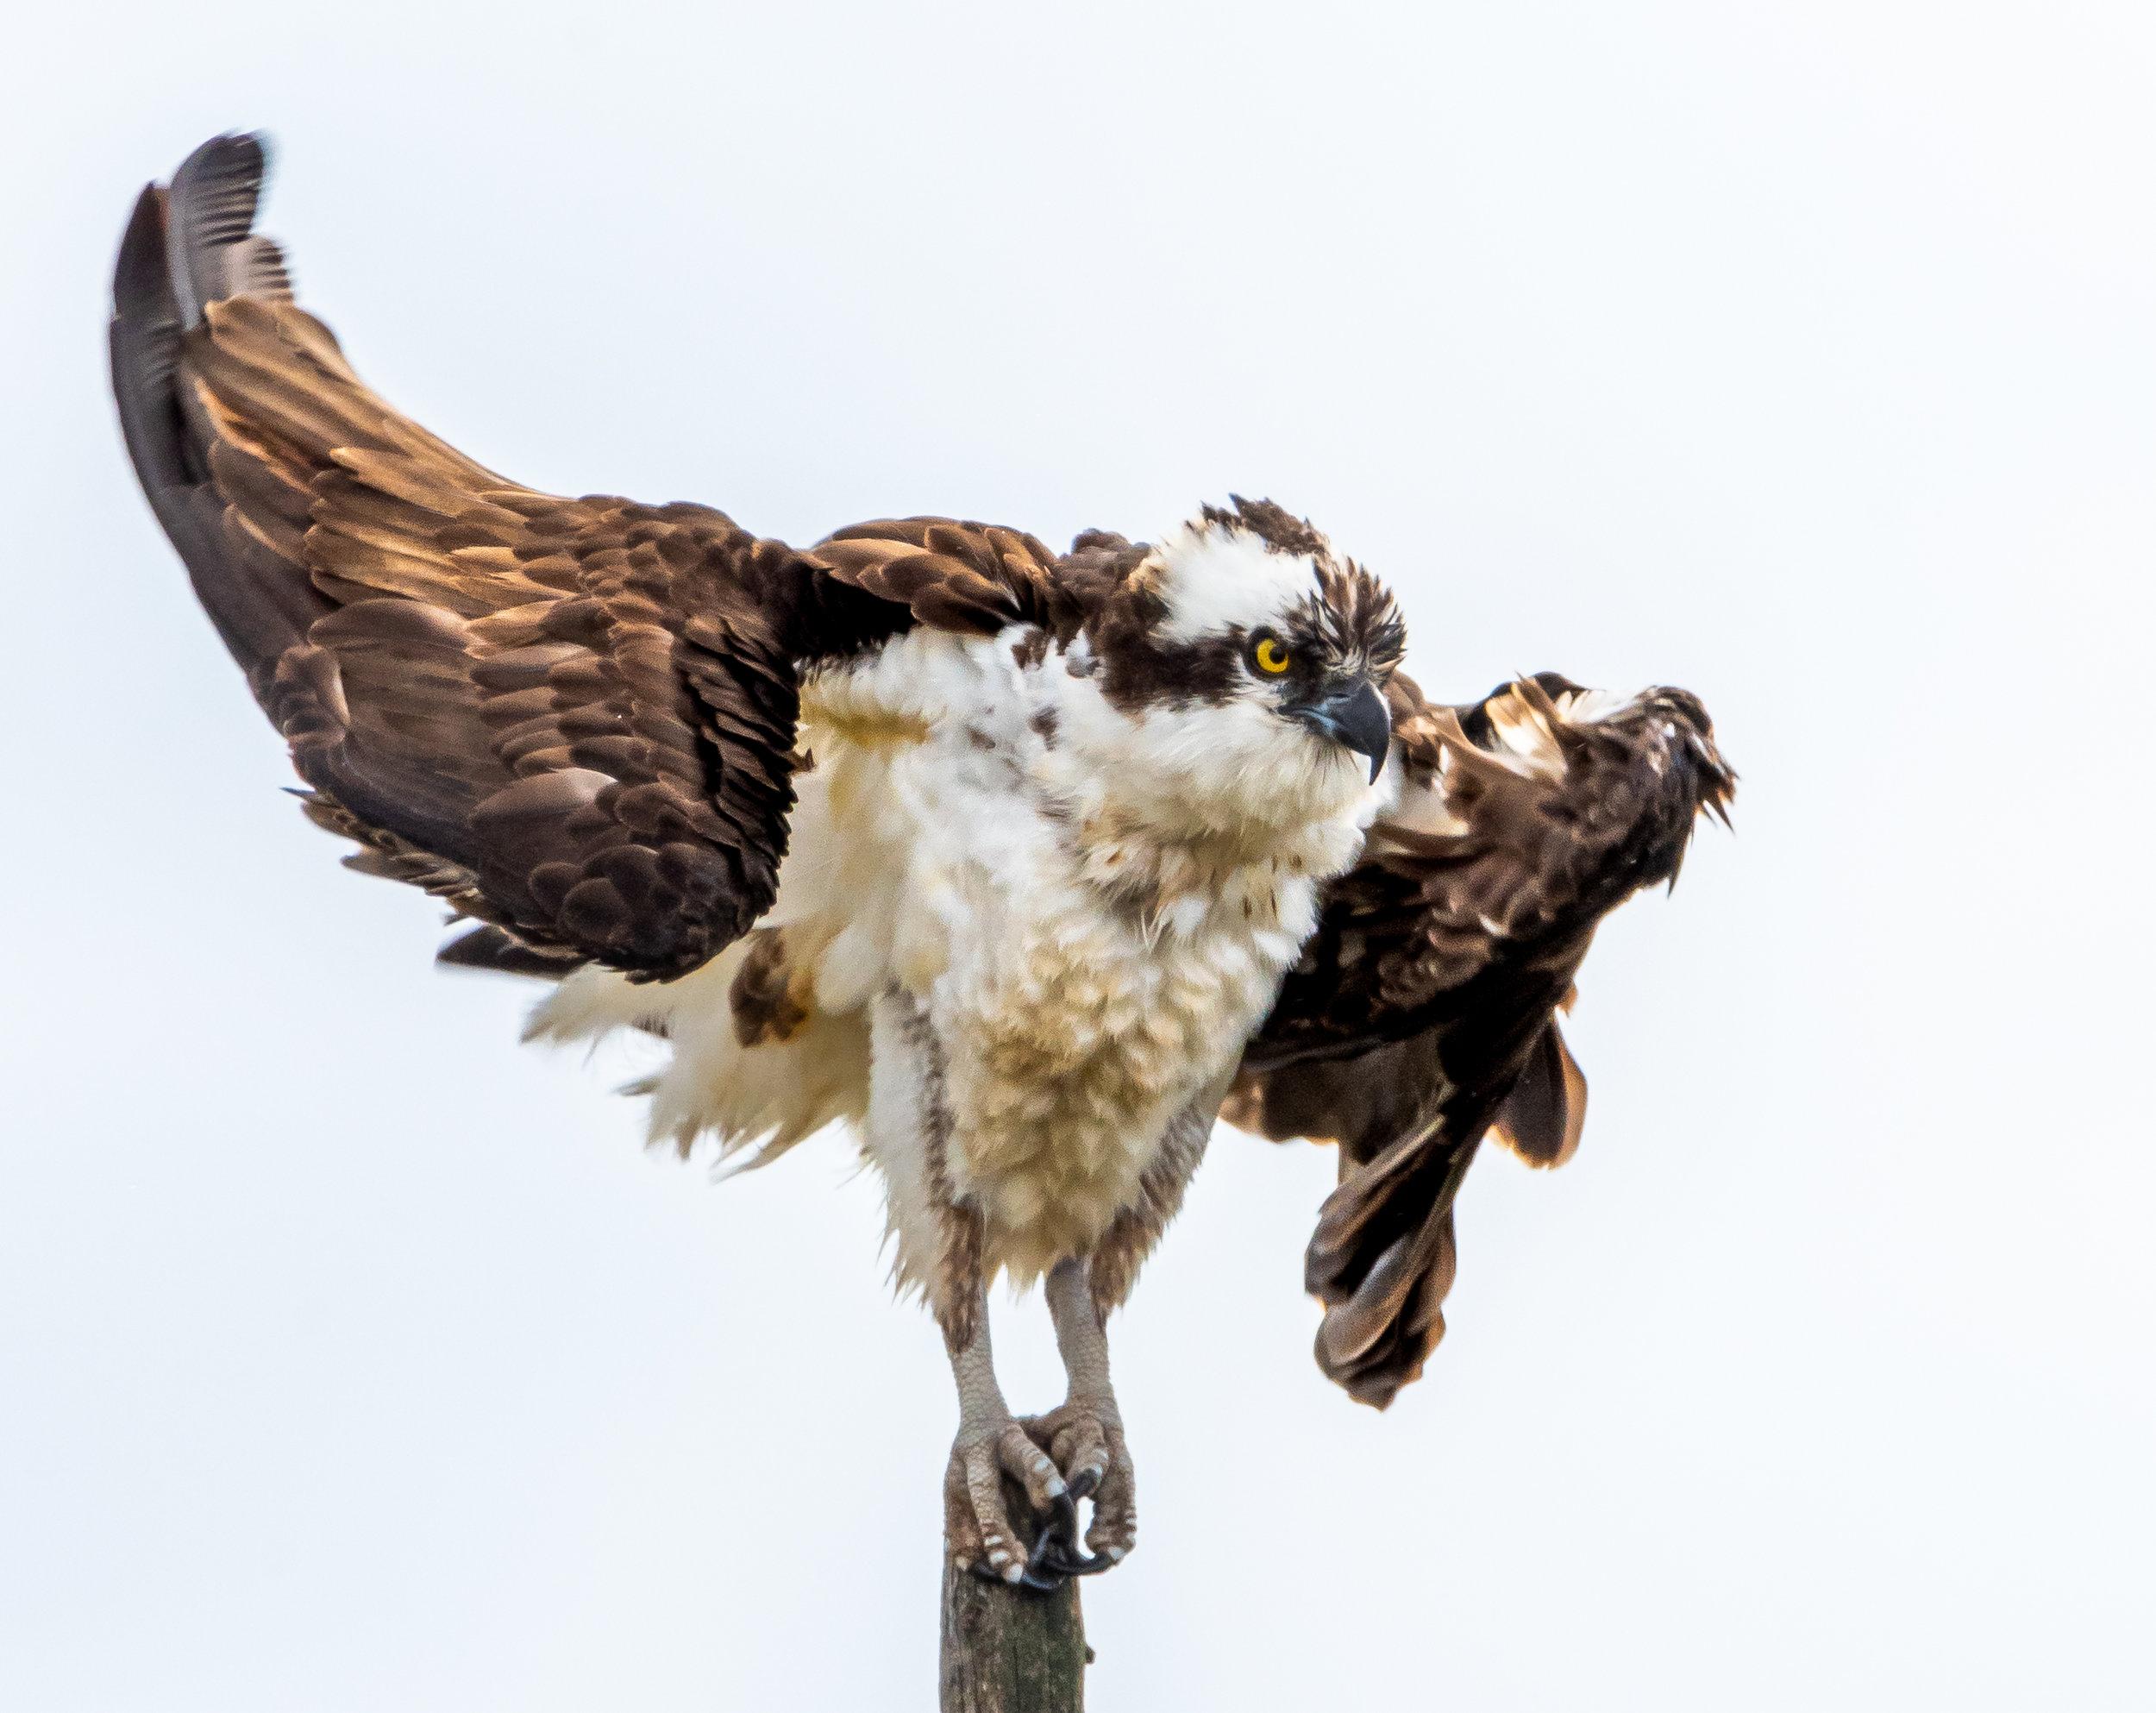 Osprey - Norris, Montana